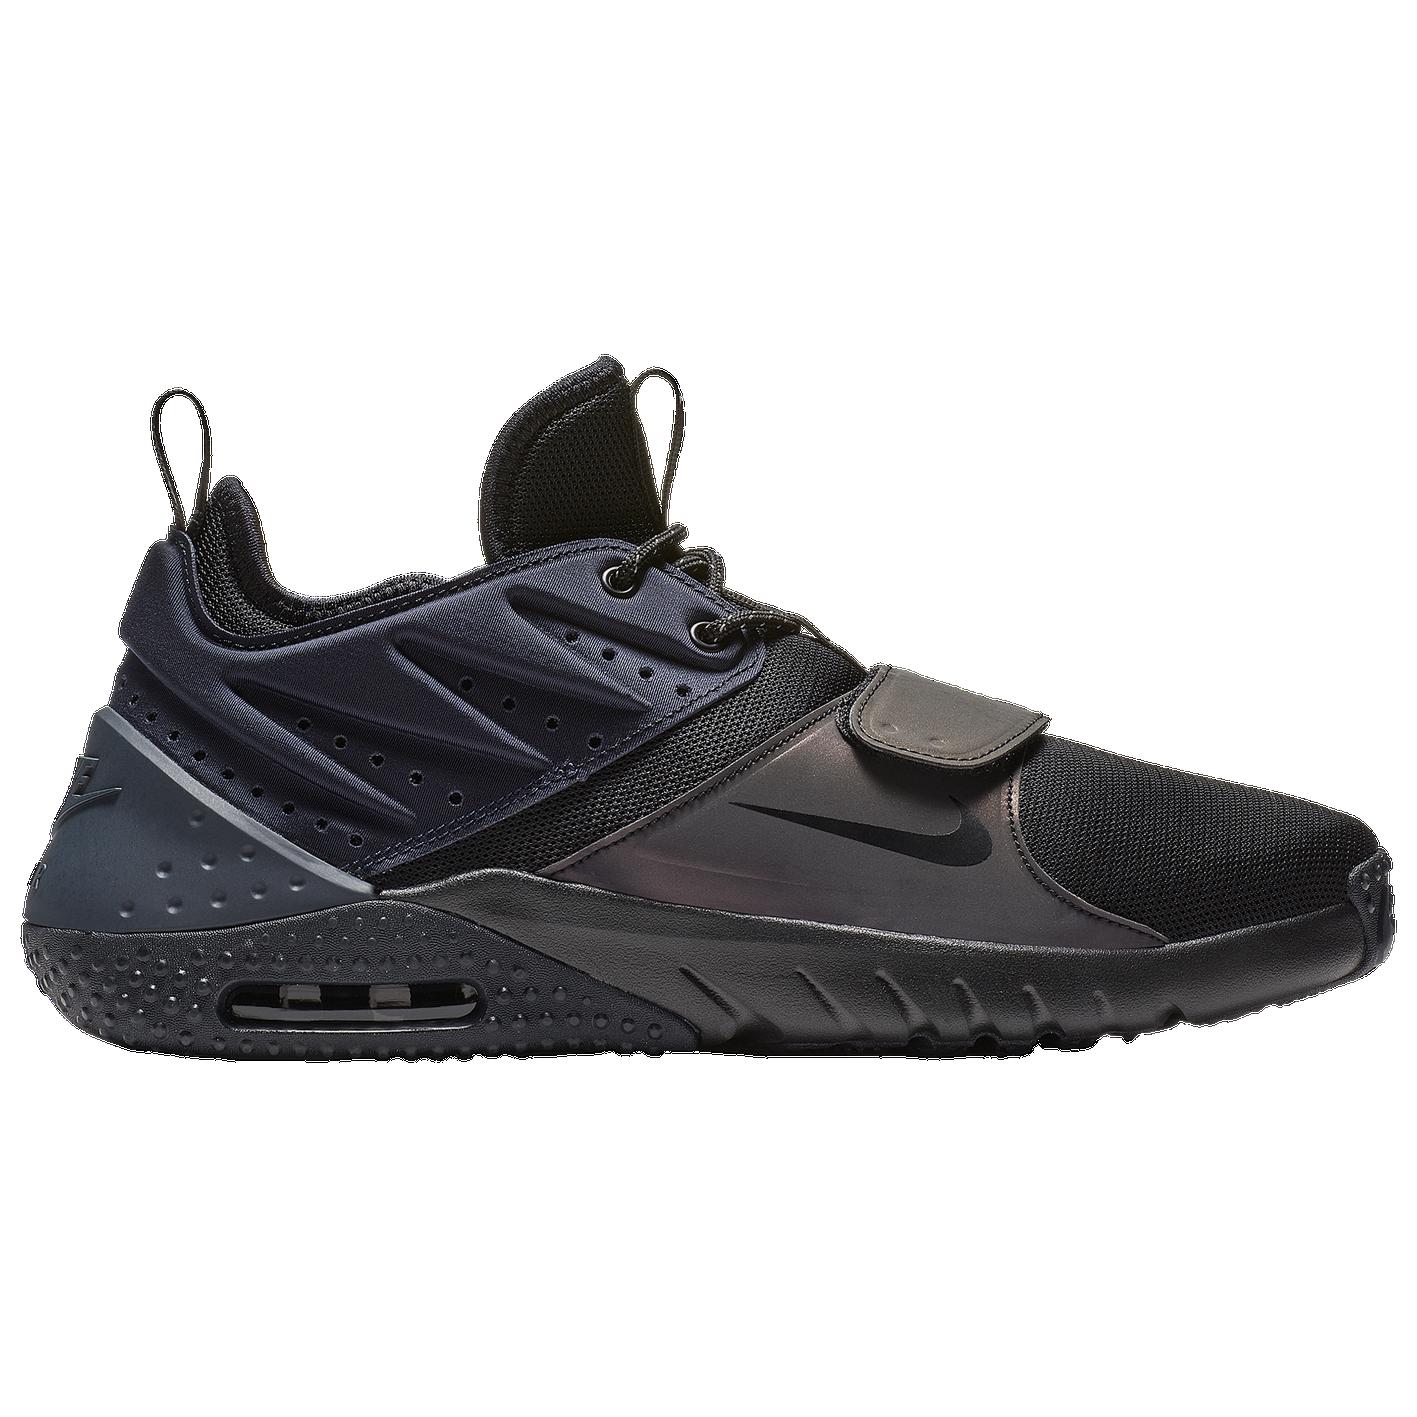 dbe4d36df436 Nike Air Max Trainer 1 - Men s - Training - Shoes - Black Dark Obsidian